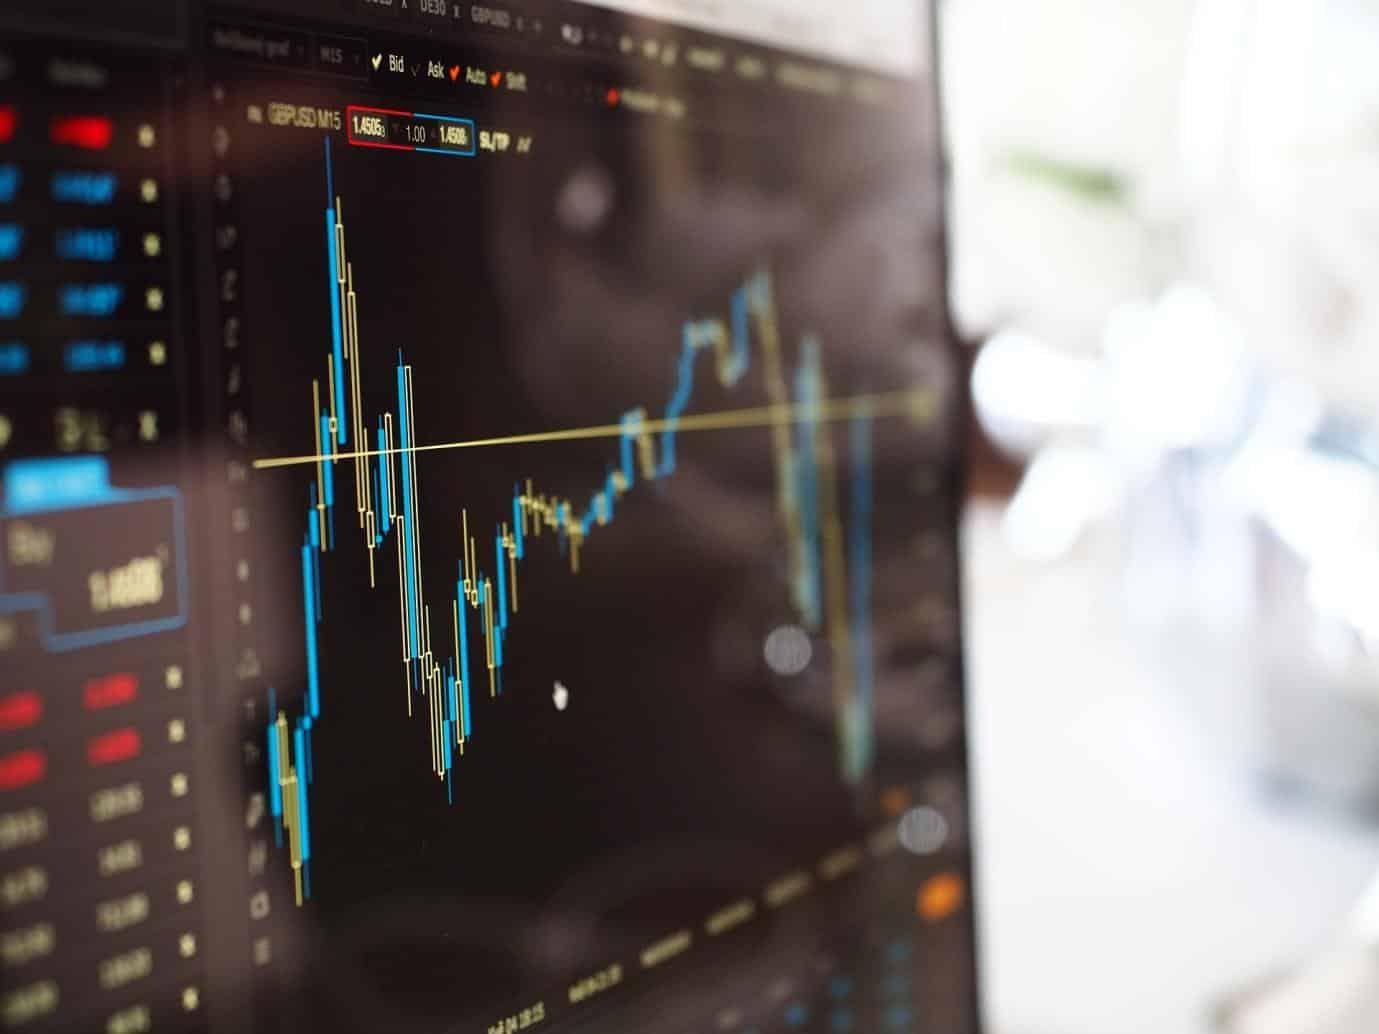 Breakdown of Cryptocurrency Market